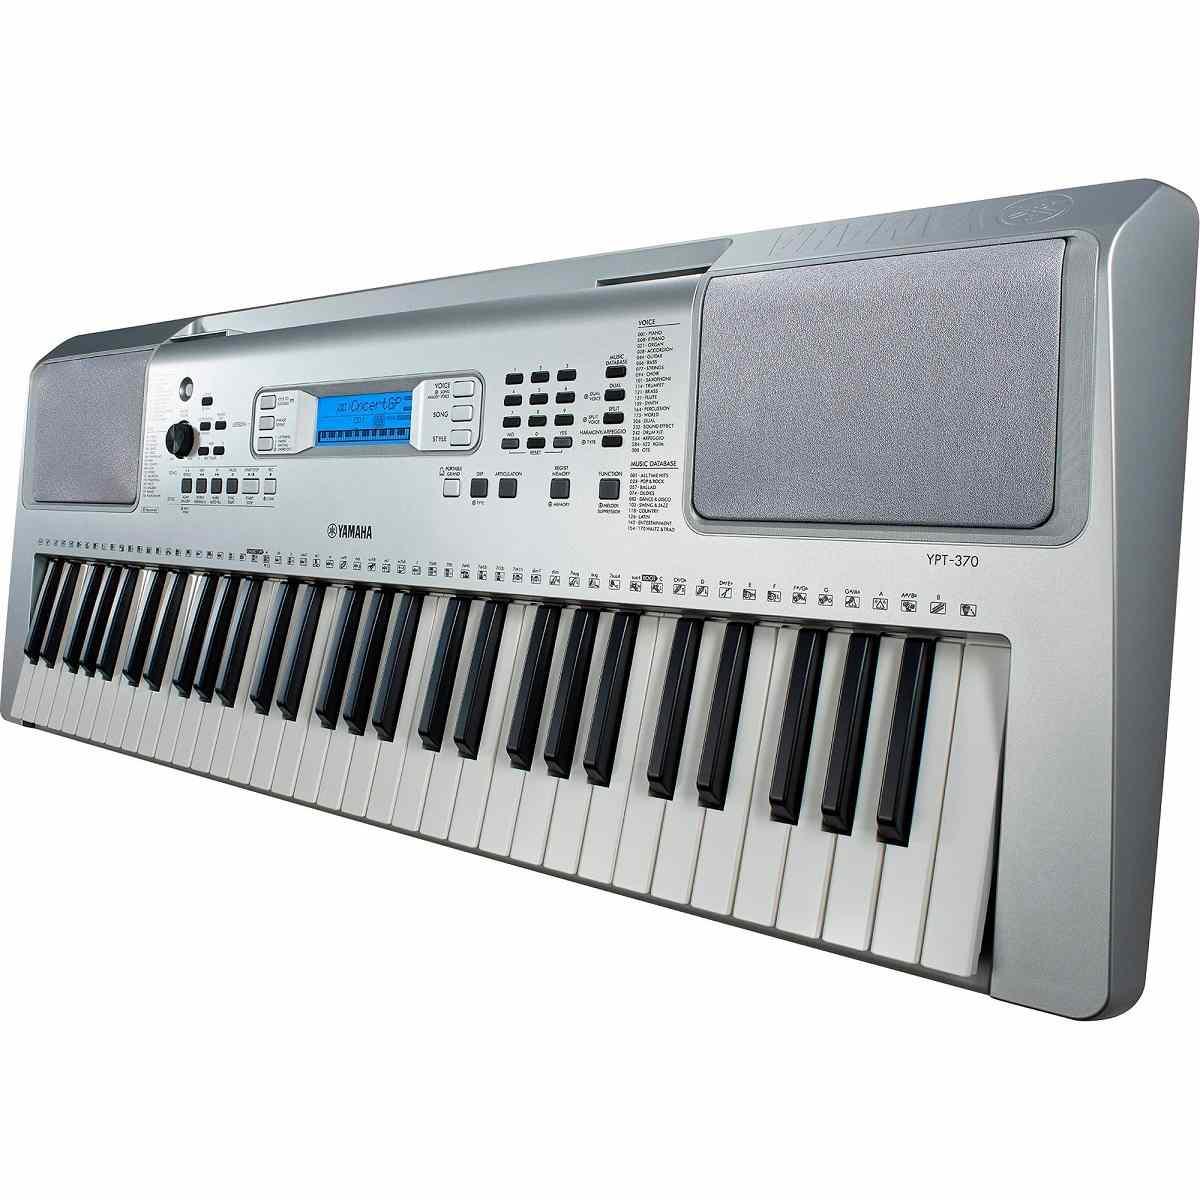 Teclado Musical Yamaha YPT370 Prata